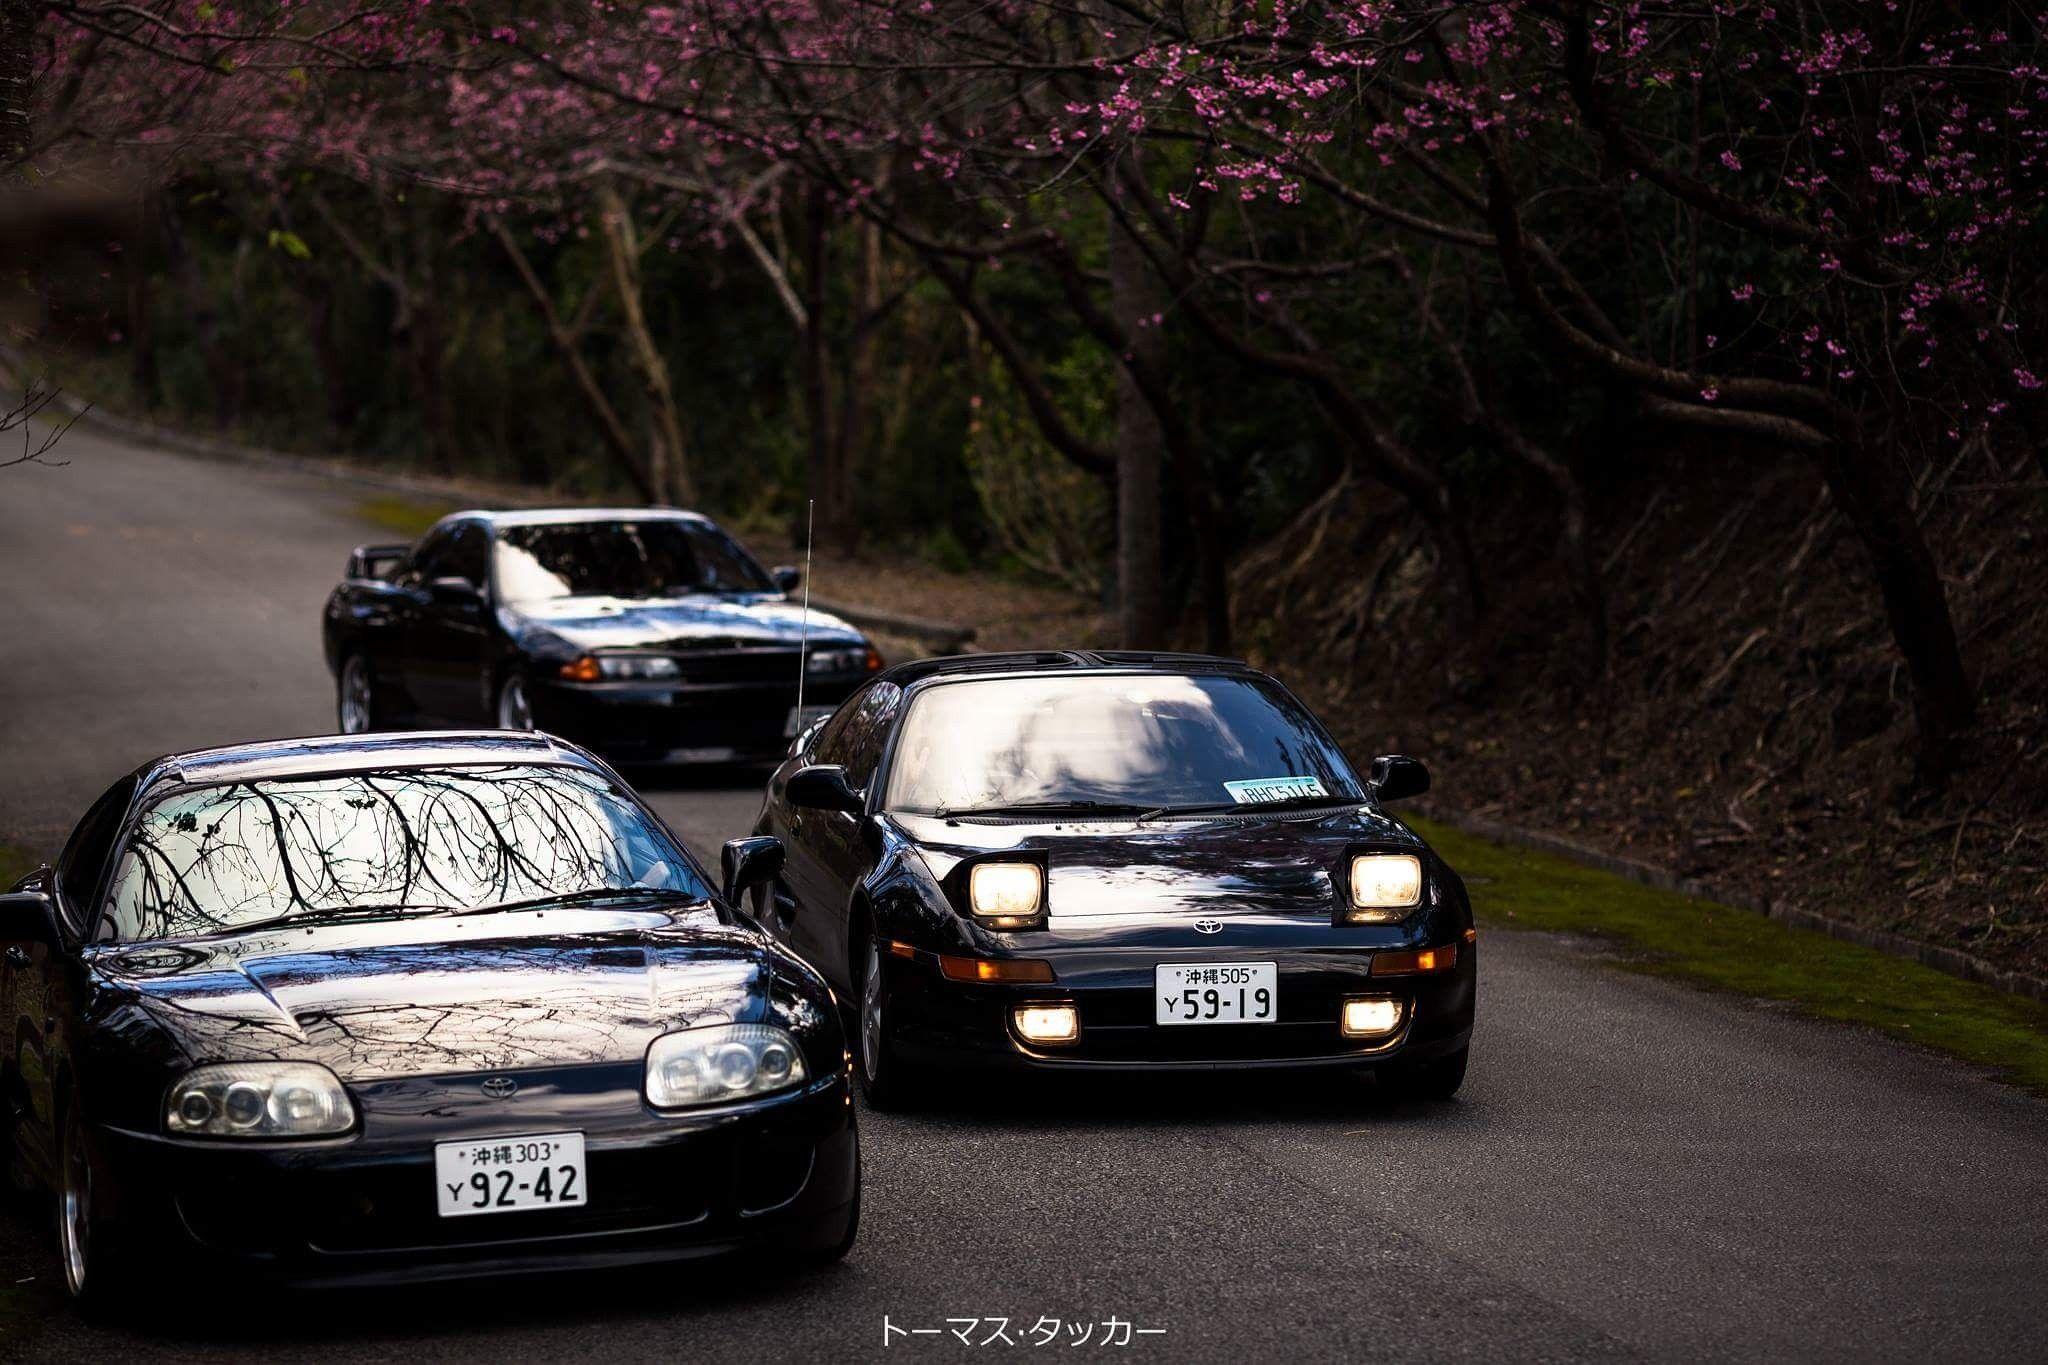 Jdm · Tree Amigos. Toyota Supra, MR2, Nissan R32 GTR Okinawa HD Wallpaper